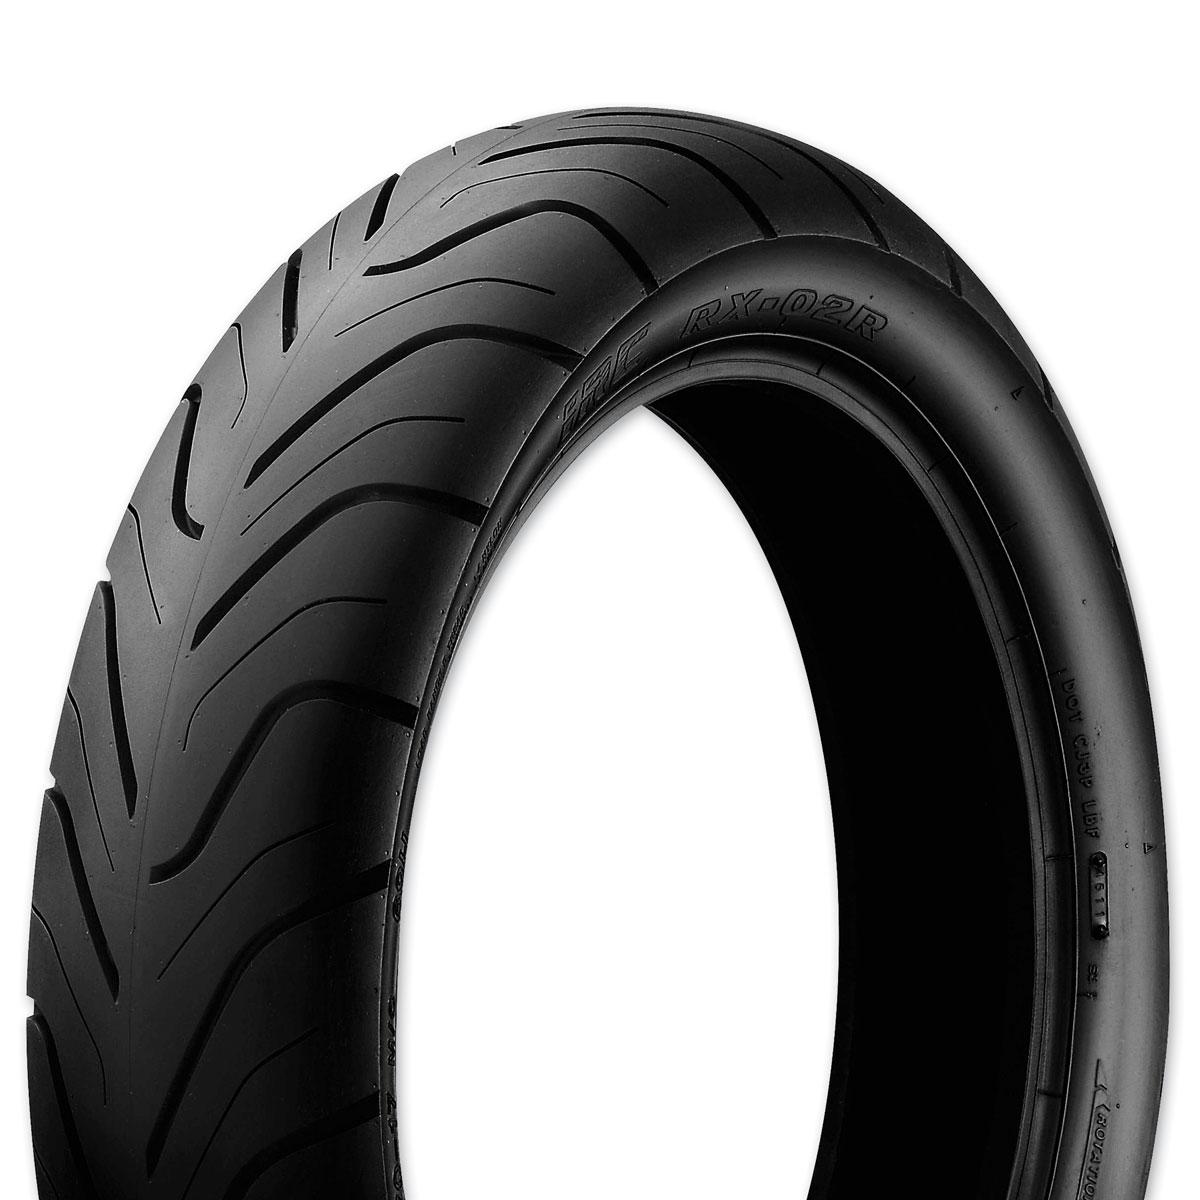 IRC RX-02 140/70-17 Rear Tire